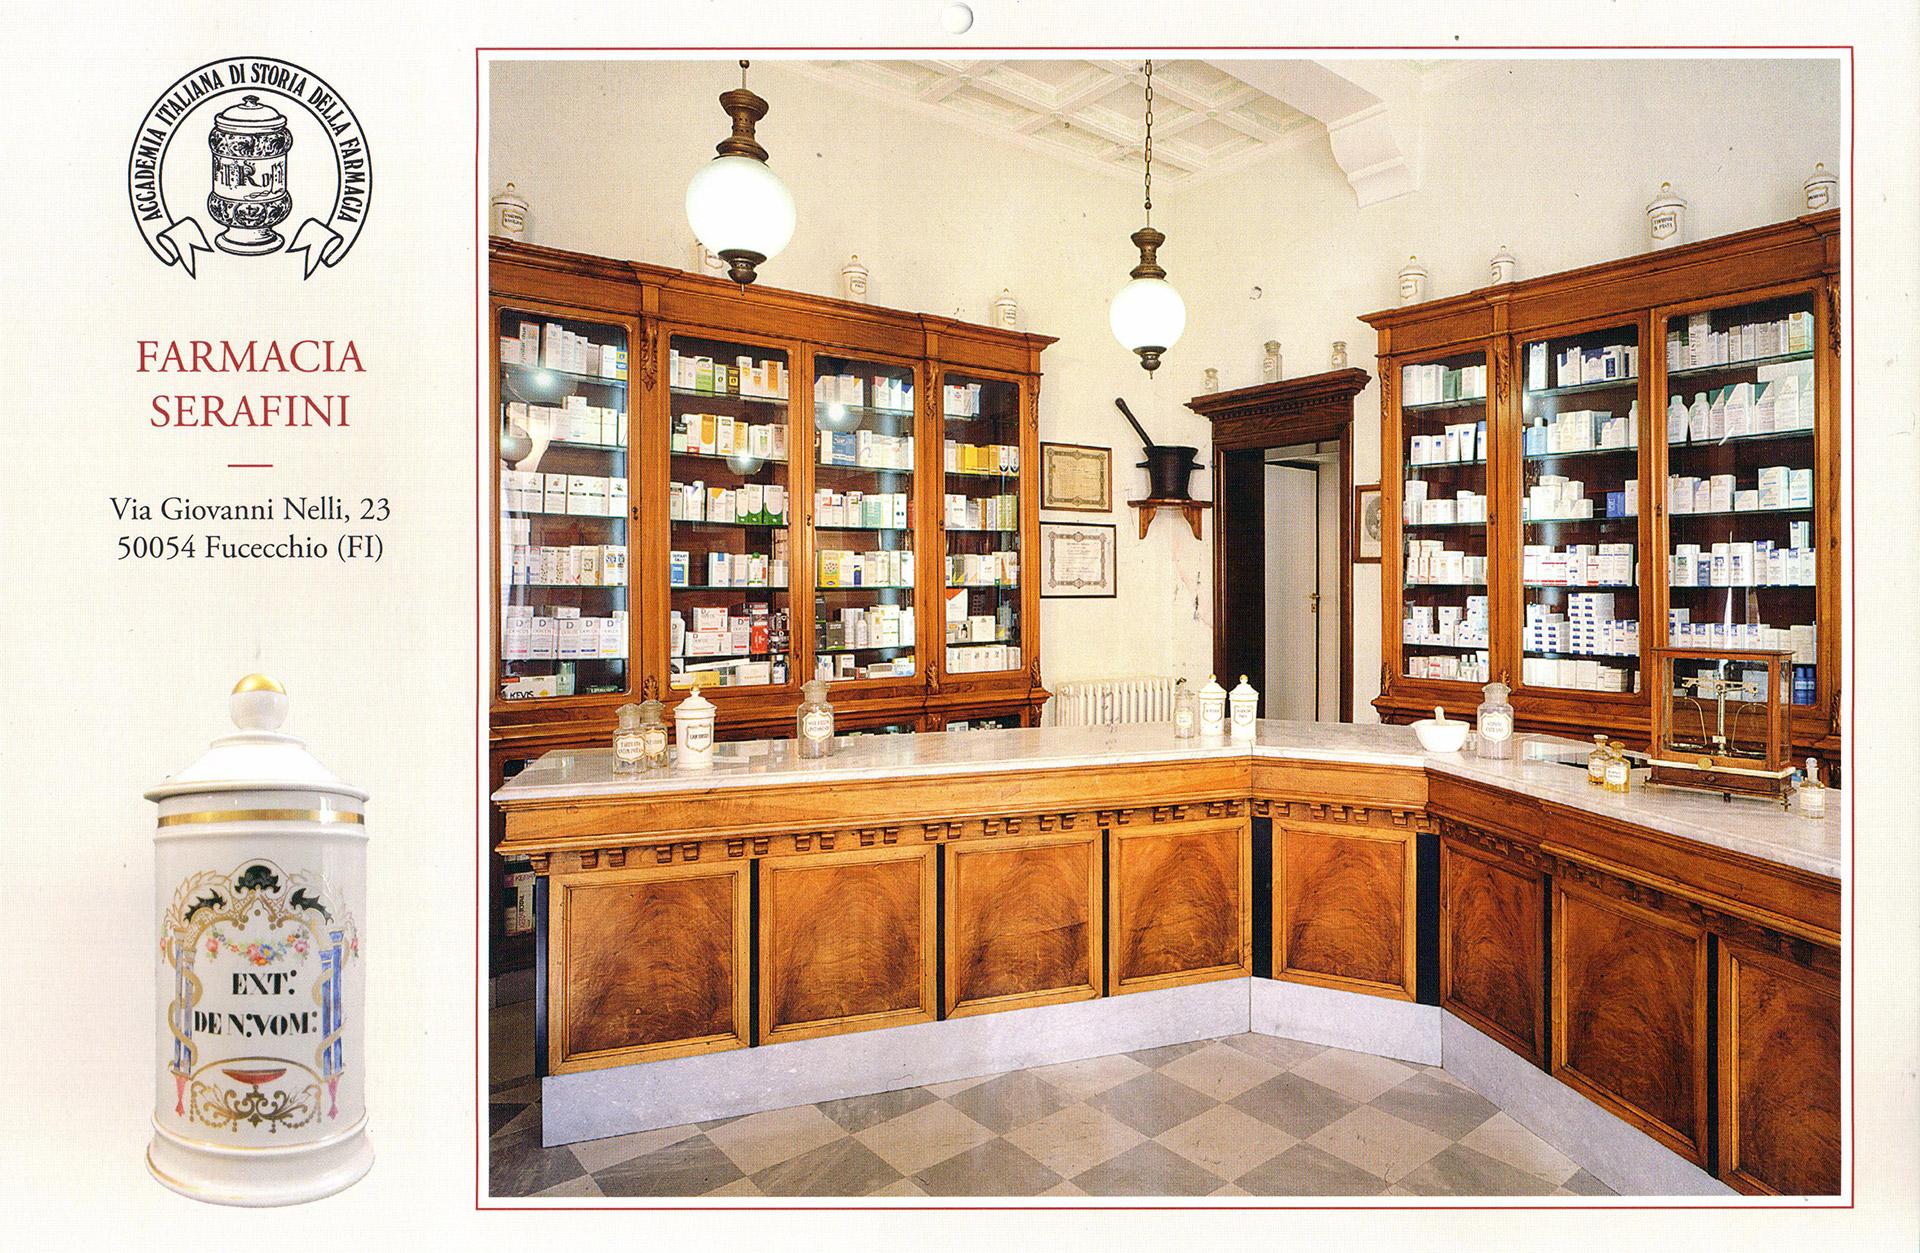 http://www.farmaciaserafini.net/wp-content/uploads/2016/09/farmacia-1.jpg